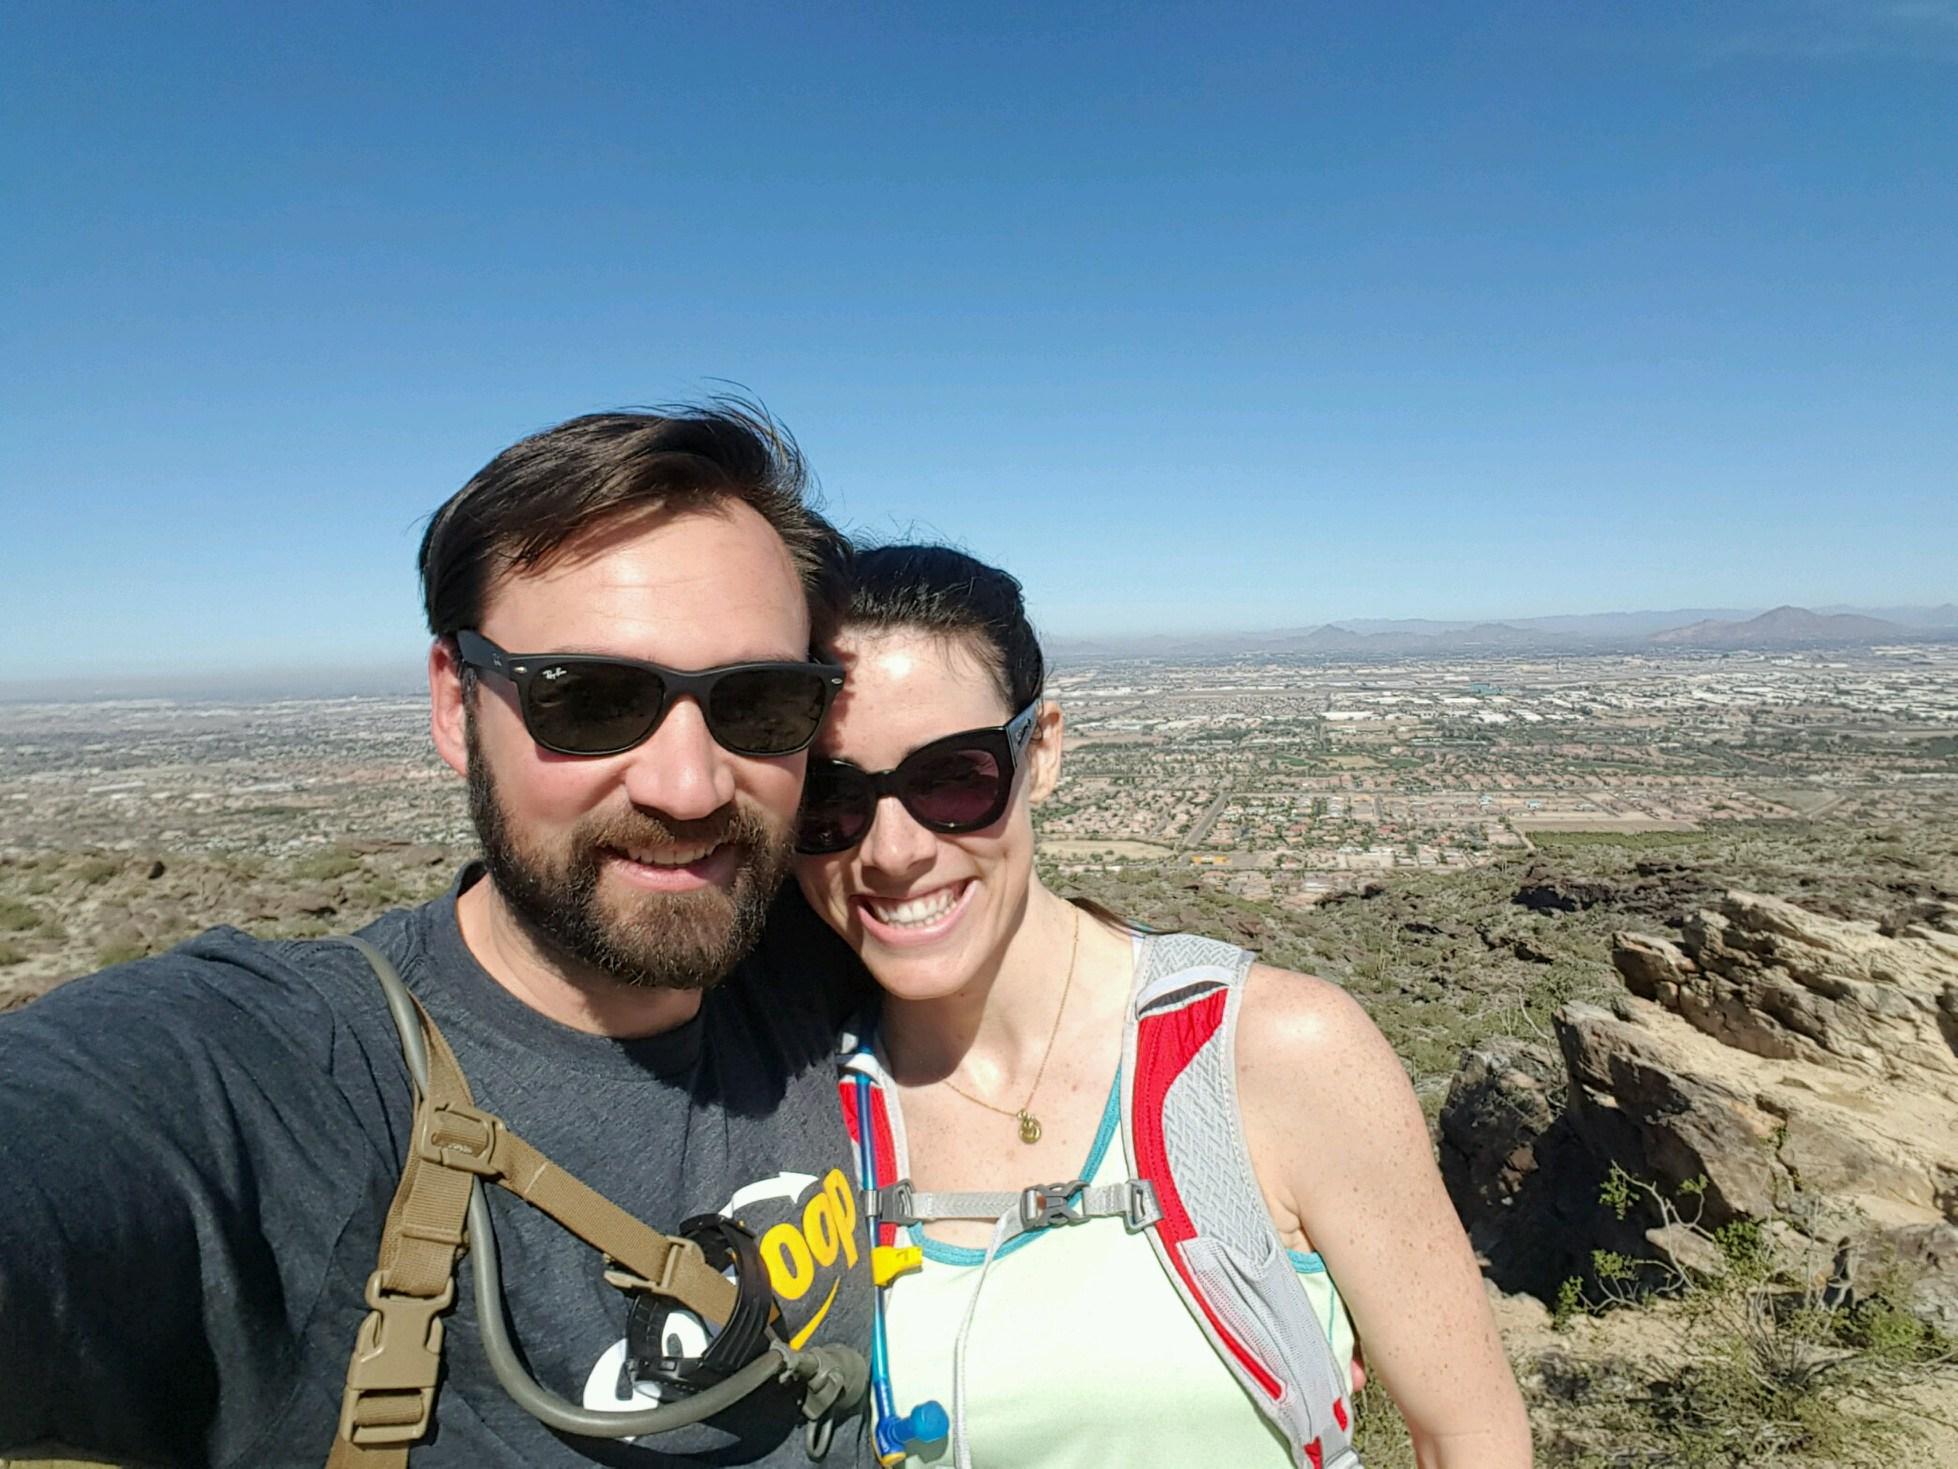 Hiking with Kristian in Phoenix, AZ. February 2016.